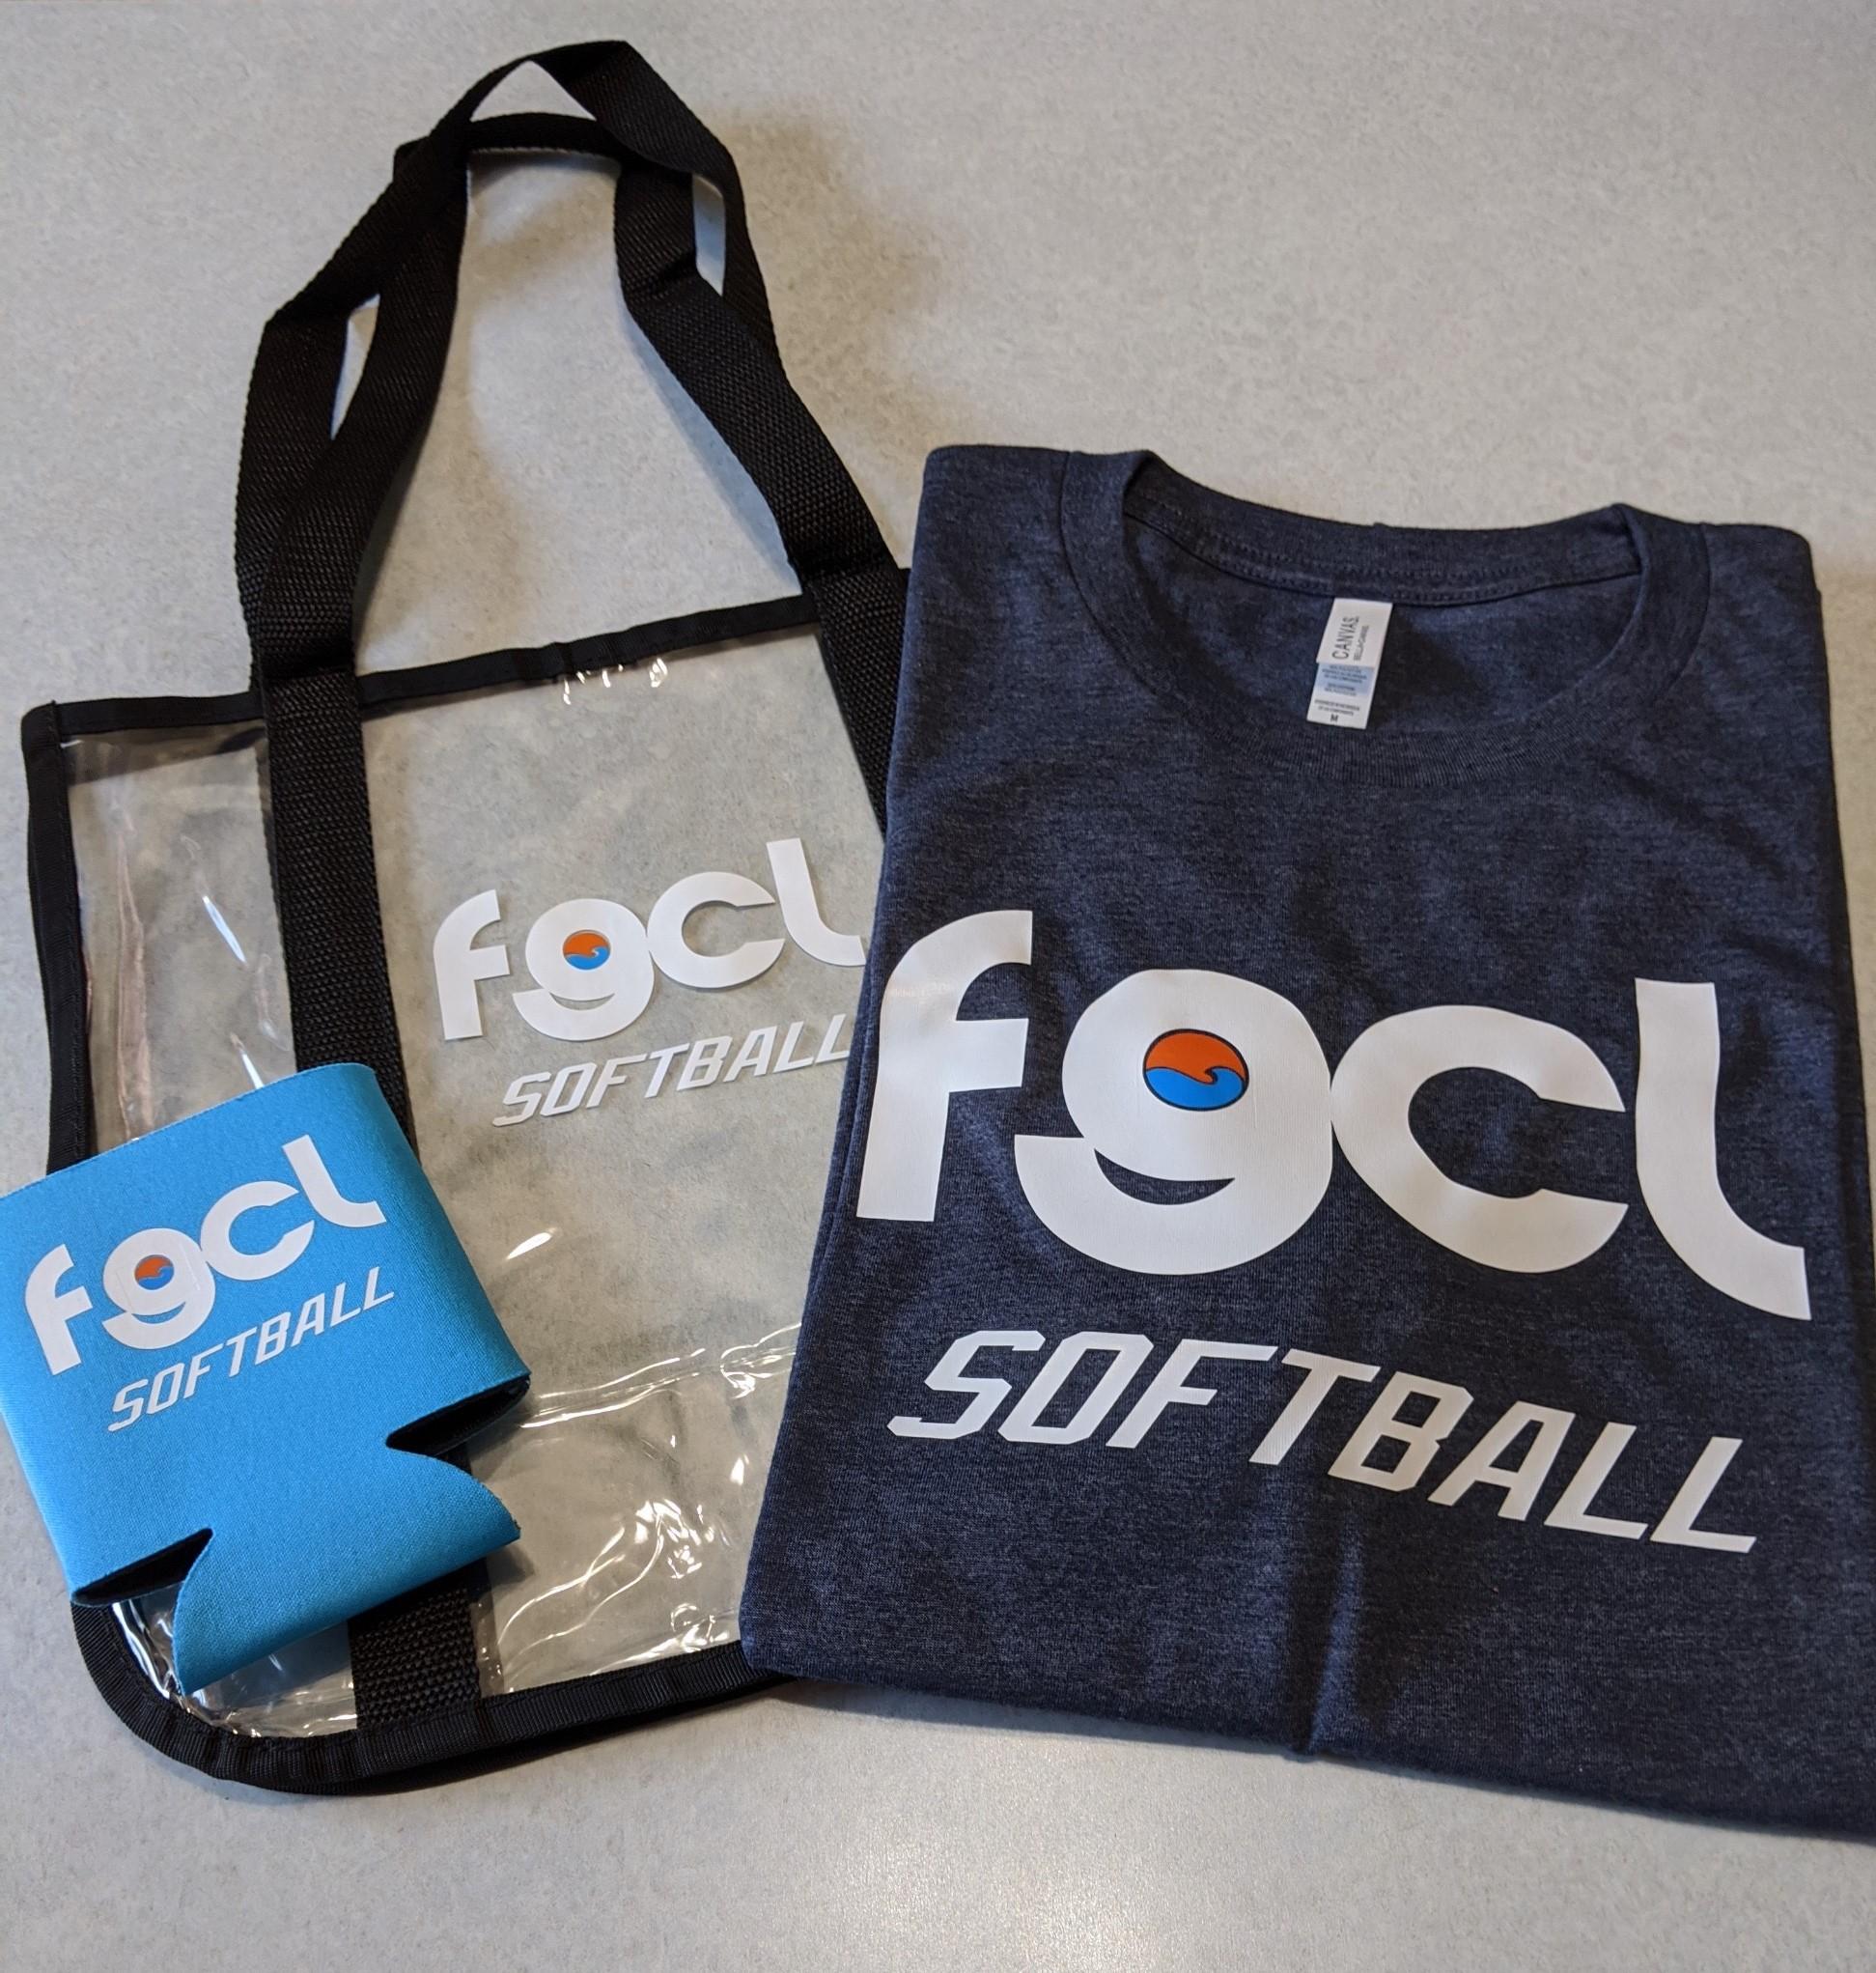 FGCL-sponsor-gifts